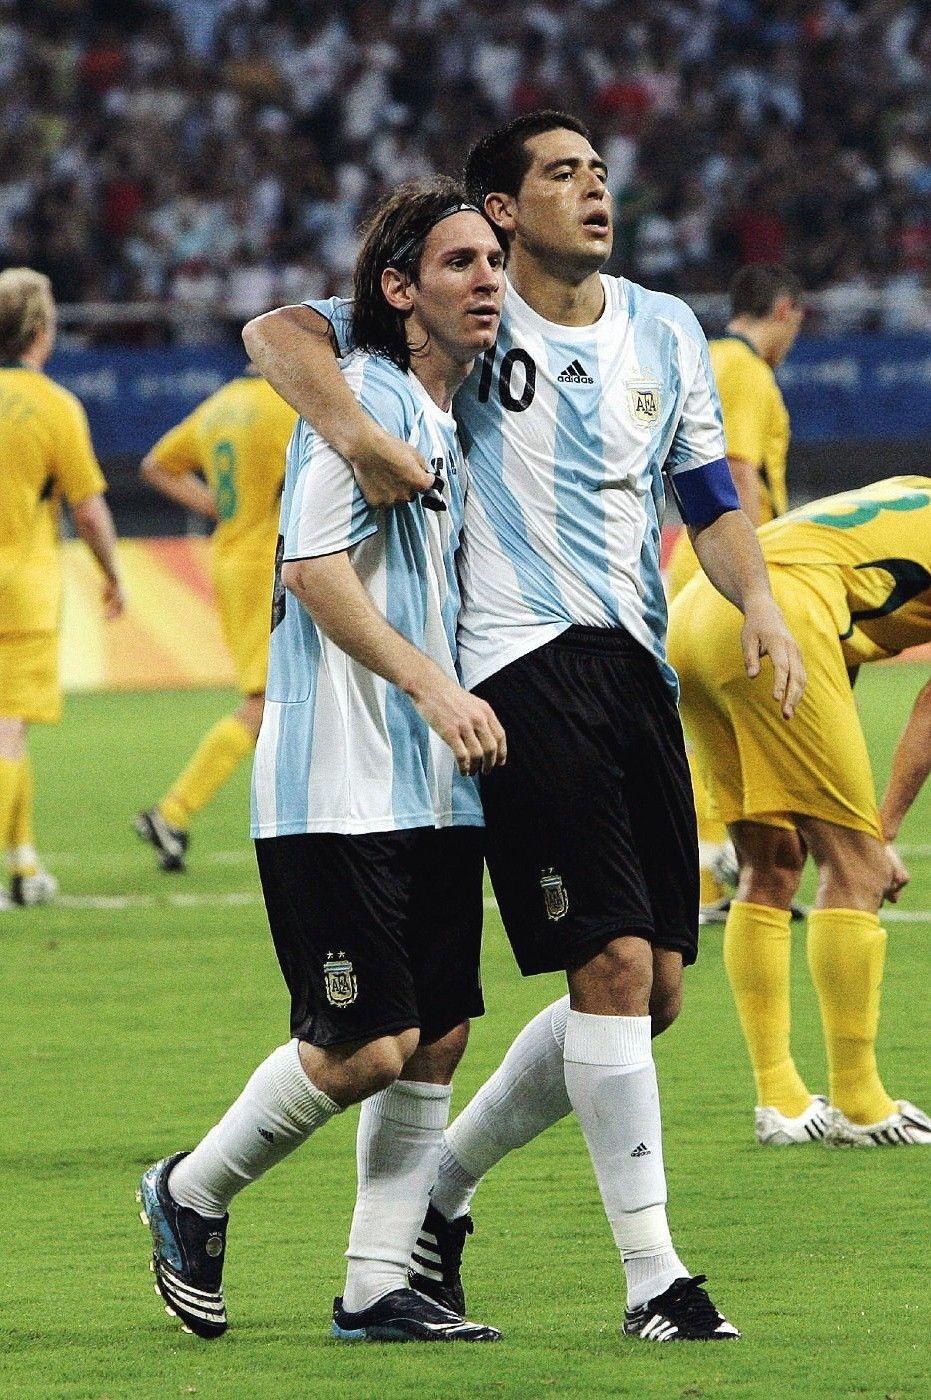 Lionel Messi Y Juan Roman Riquelme  E A Bd E A Bd